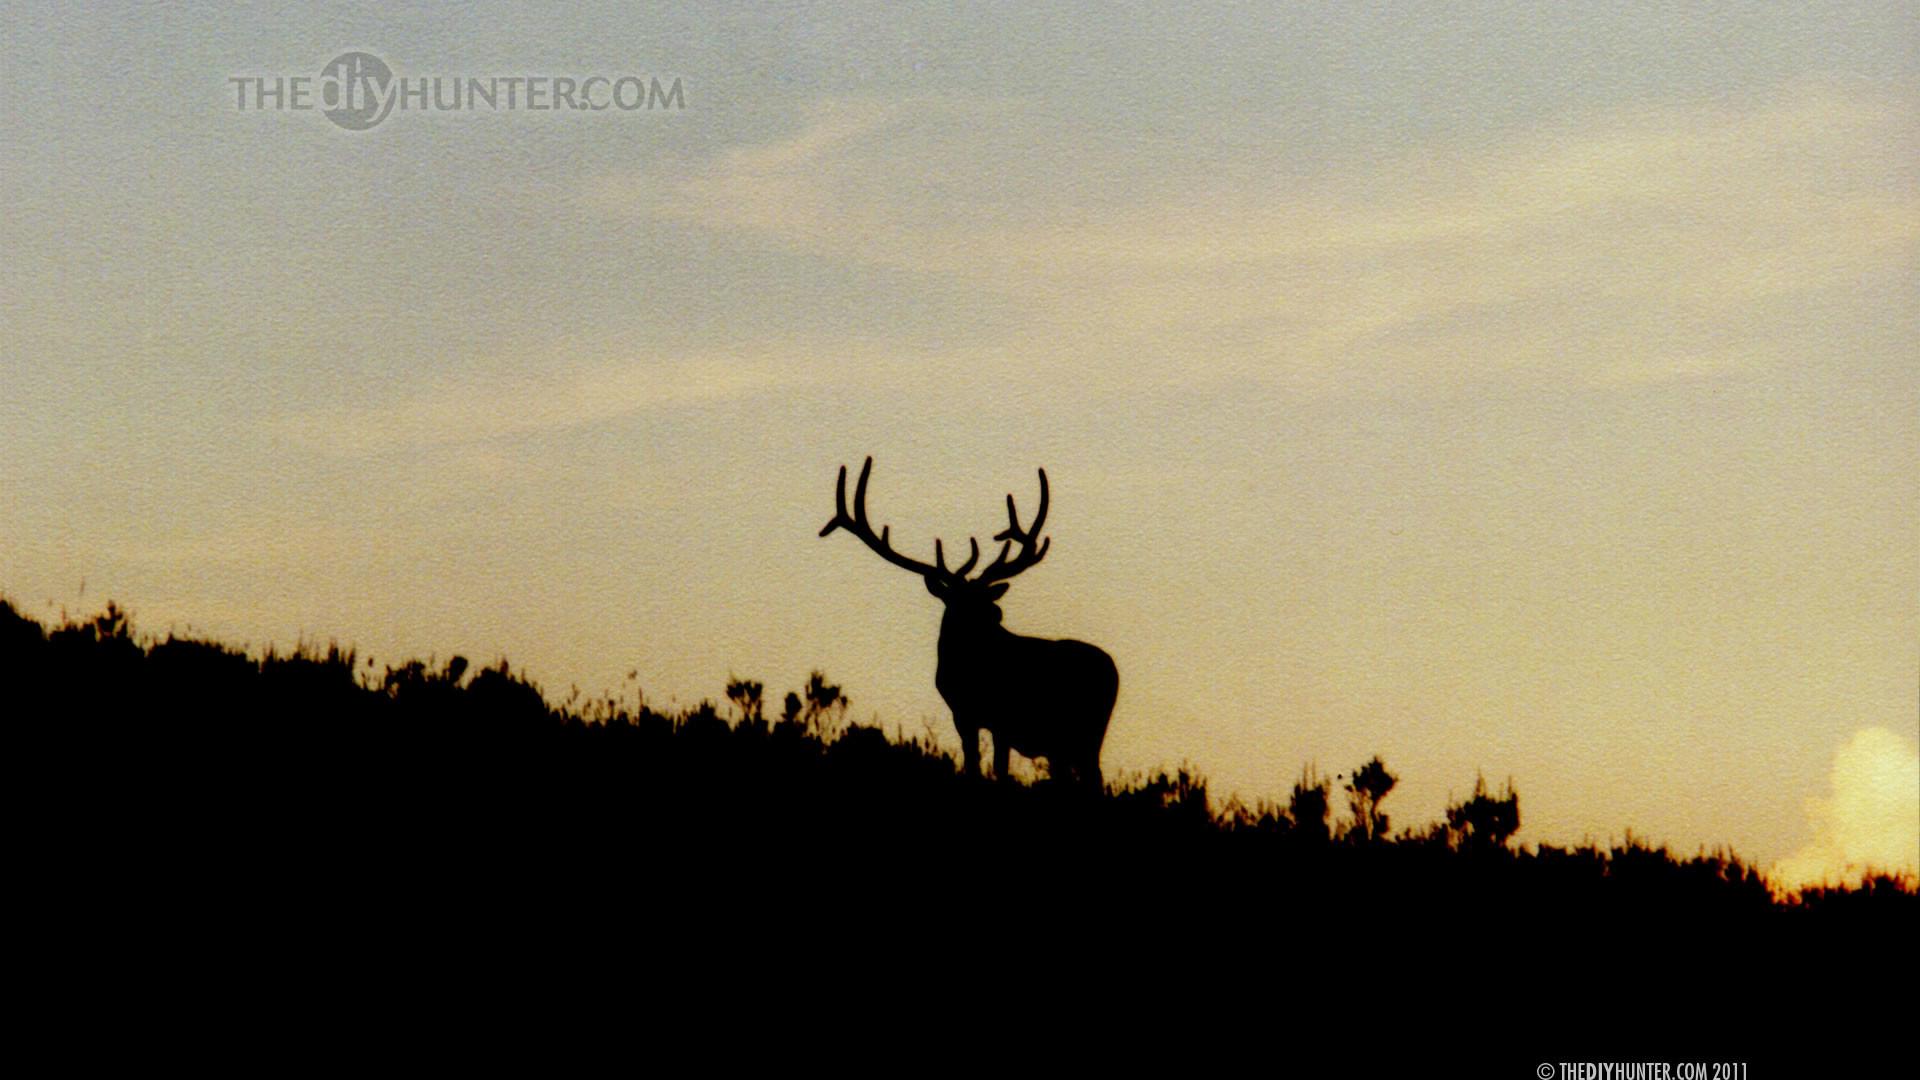 Hunting Wallpaper HD | Wallpapers 4k | Pinterest | Hunting wallpaper and  Wallpaper